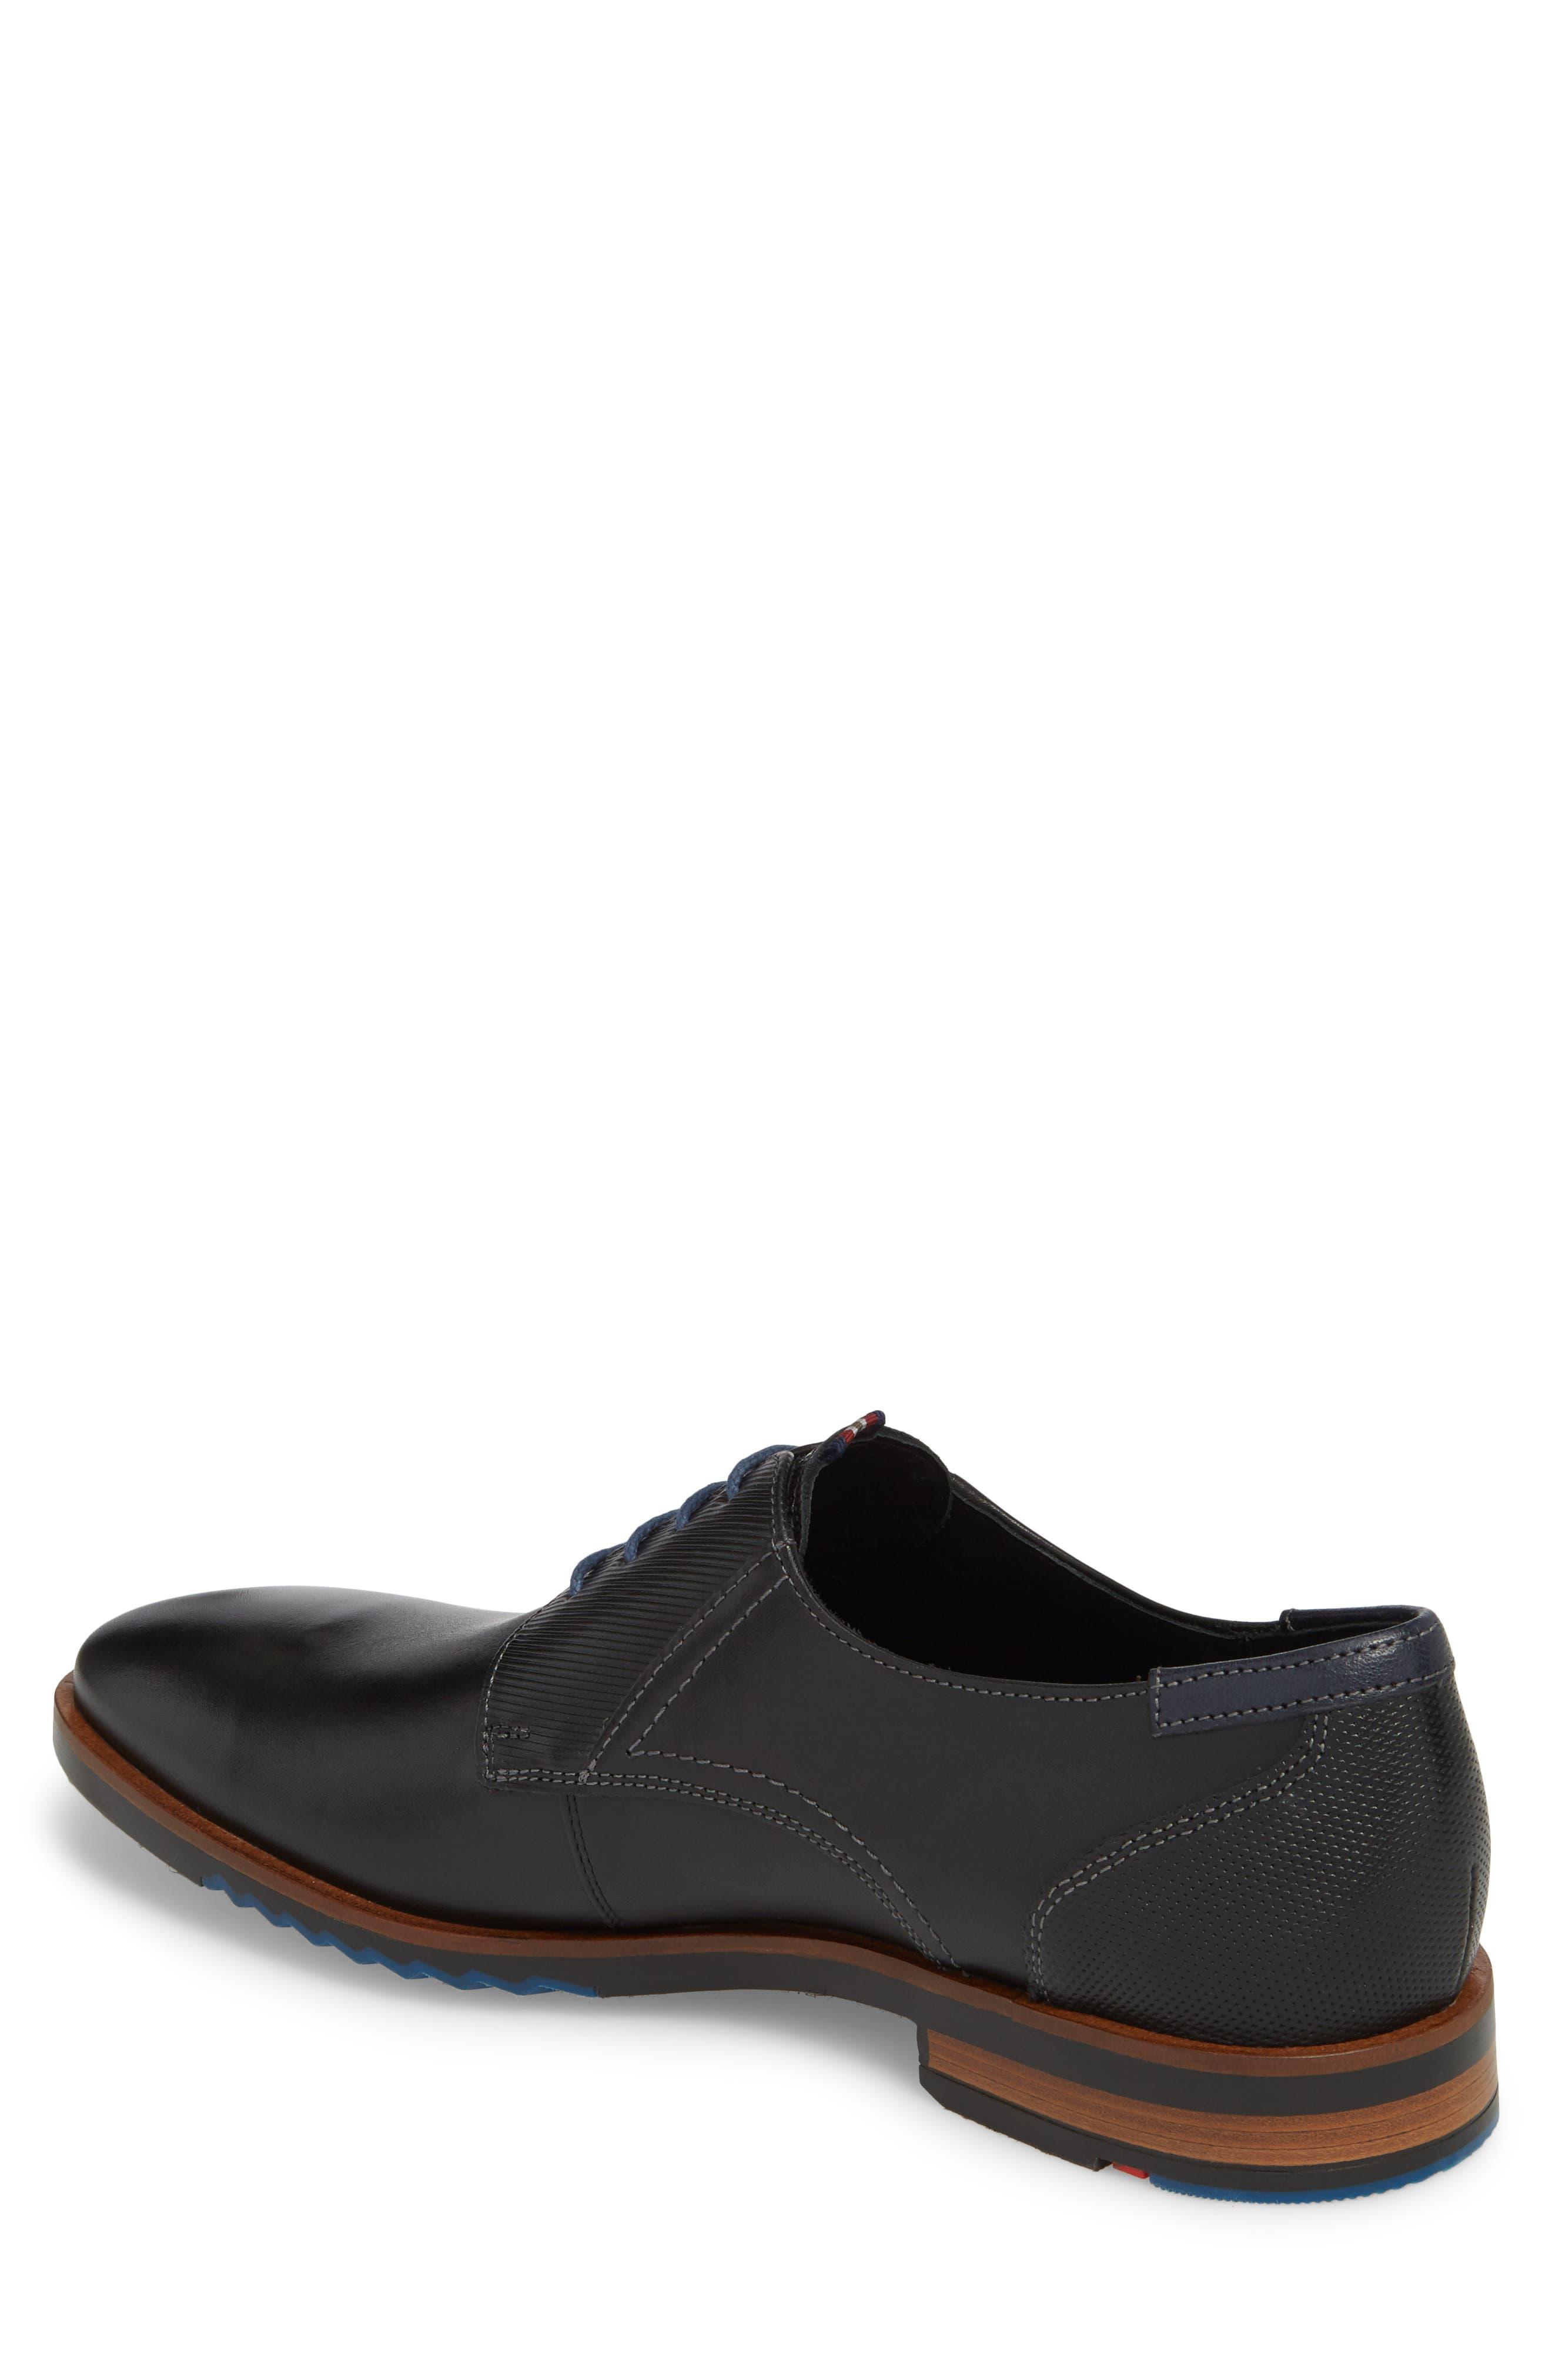 Deno Plain Toe Derby,                             Alternate thumbnail 2, color,                             BLACK/ BLUE LEATHER